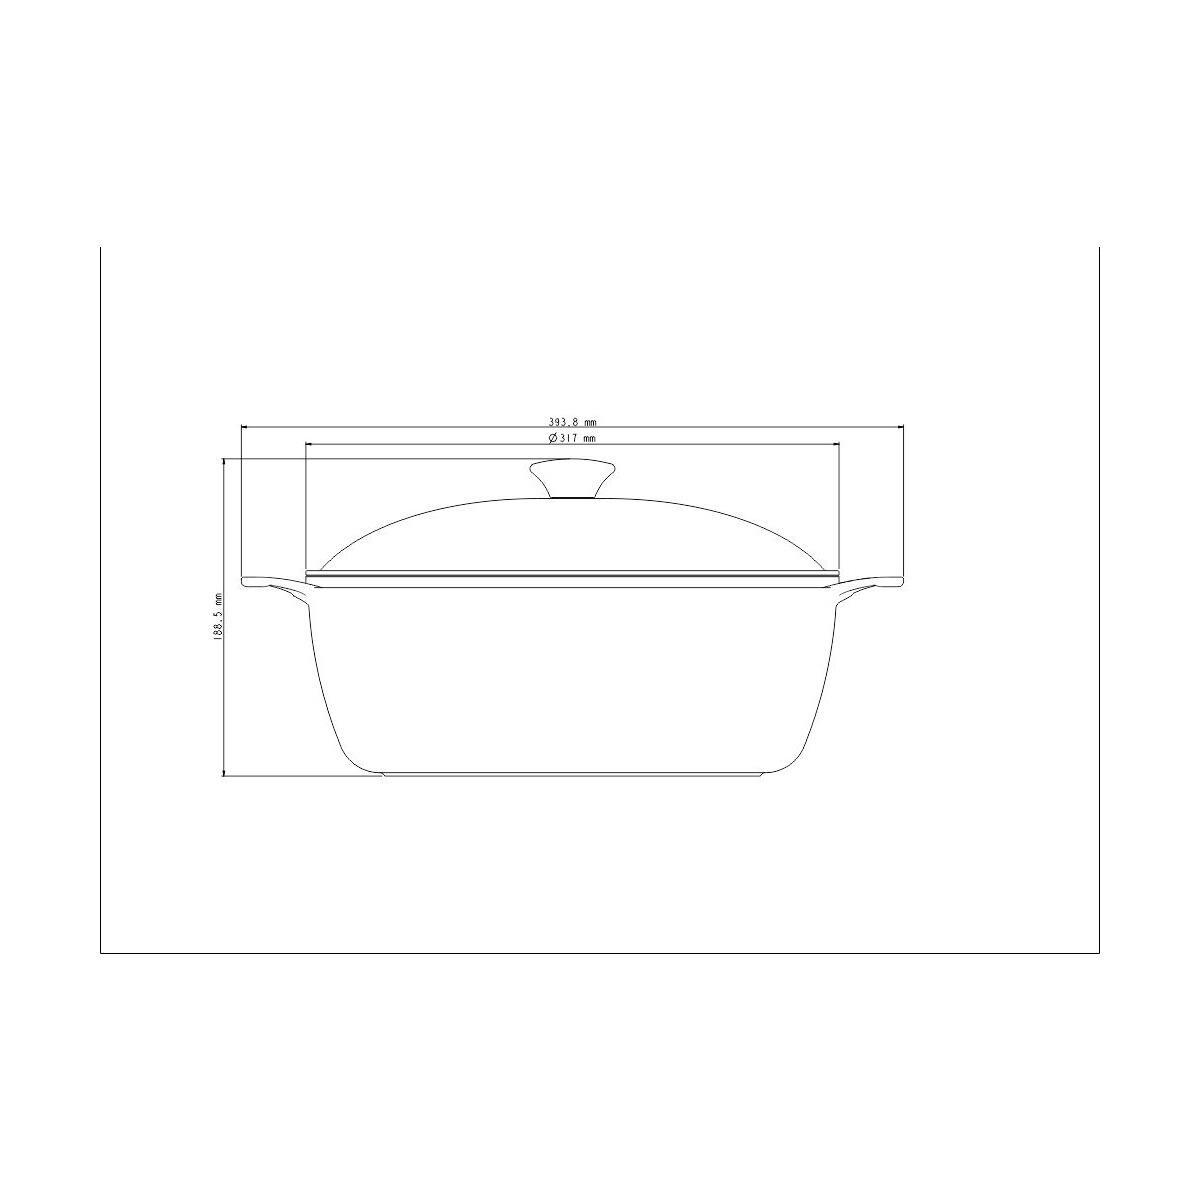 Caçarola Tramontina Preta em Alumínio Forjado com Revestimento Interno Antiaderente Starflon T5 Com Tampa 30 cm 7 L Tramontina 20960030